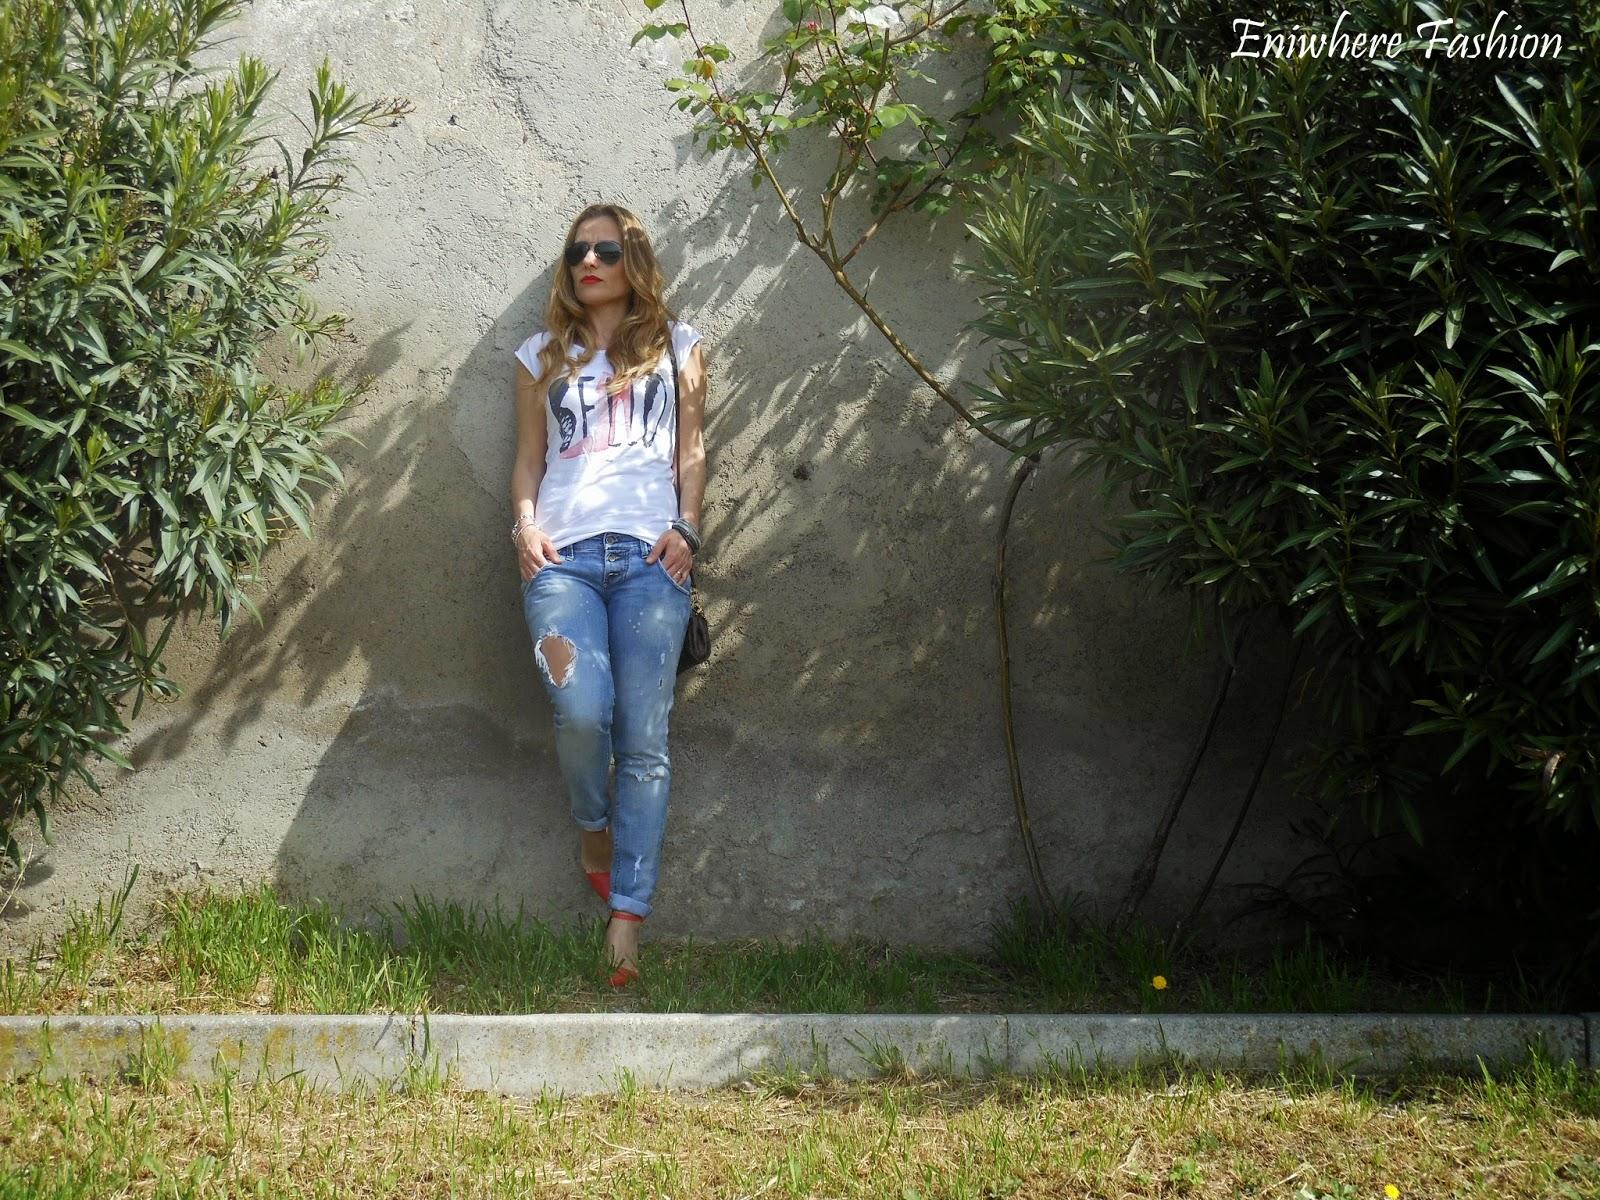 Eniwhere Fashion - Franciacorta outfit